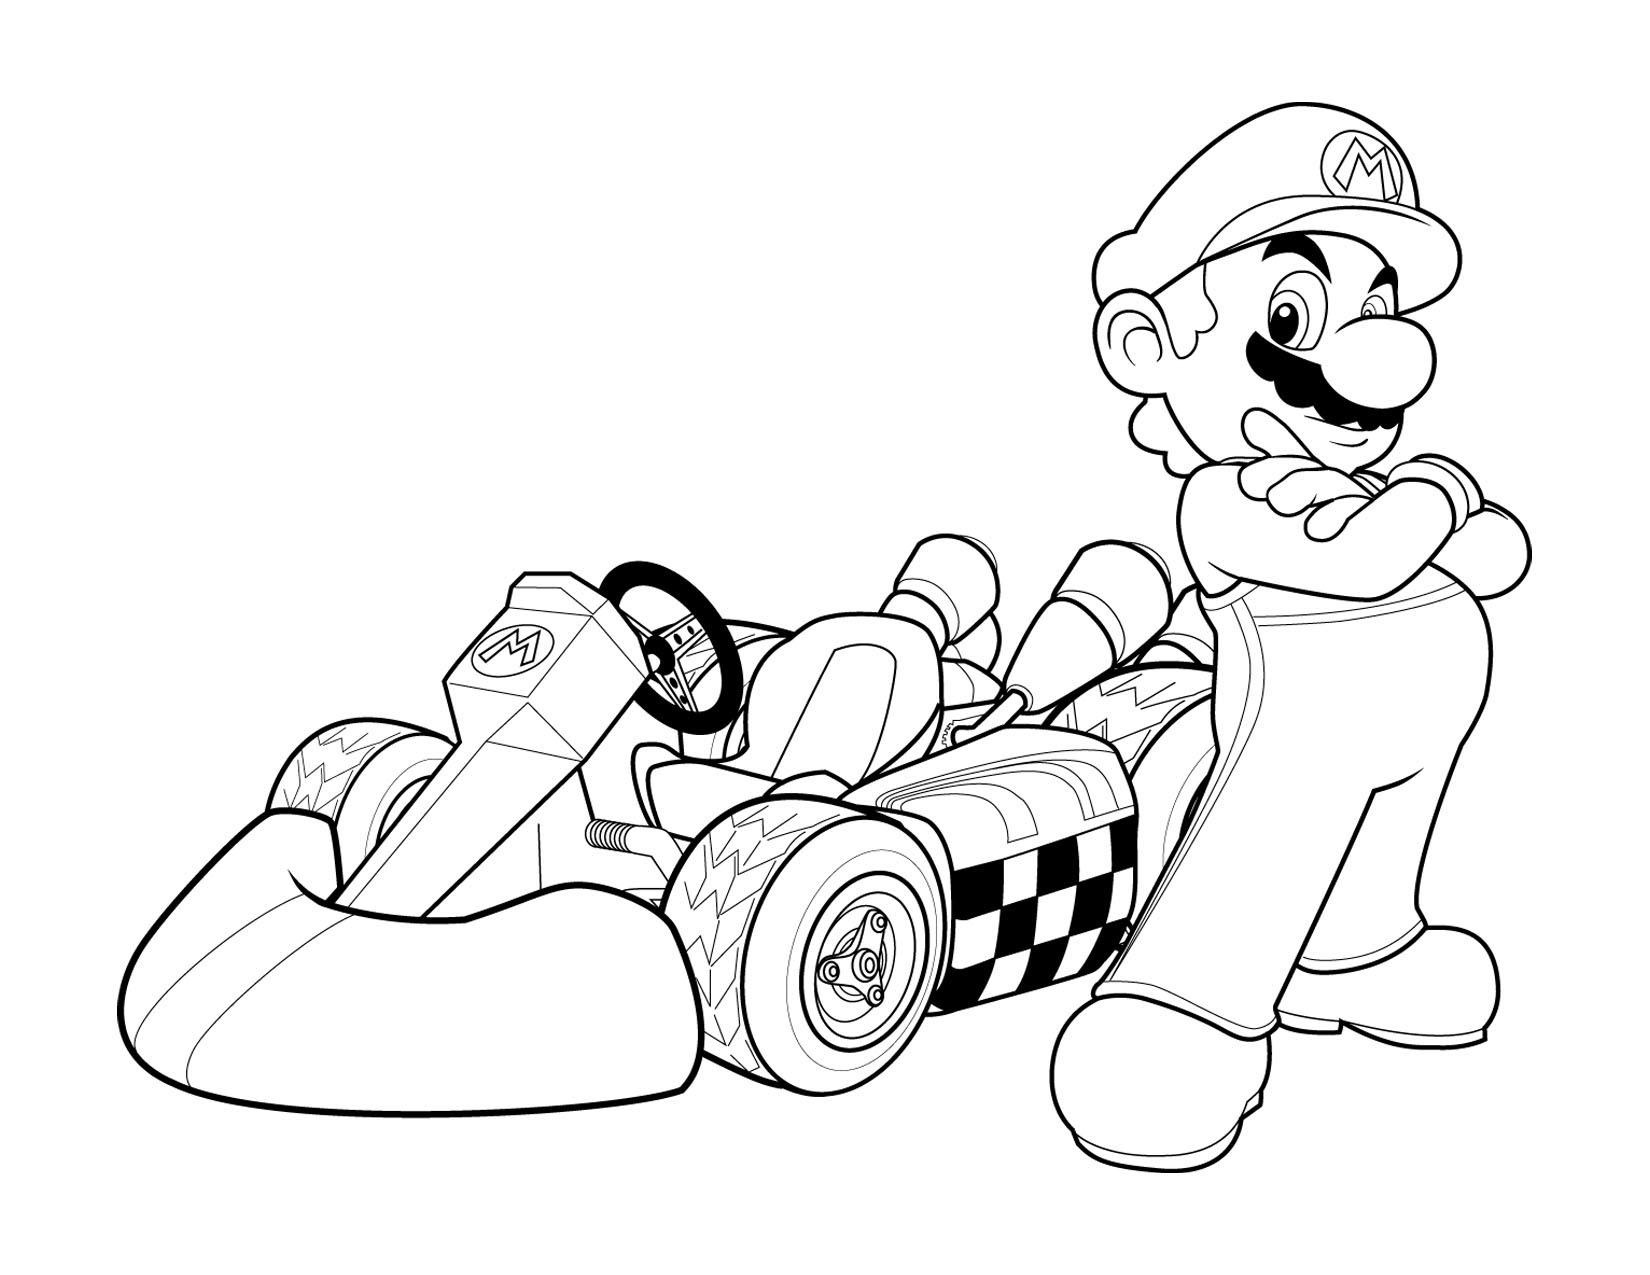 Super Mario and his car